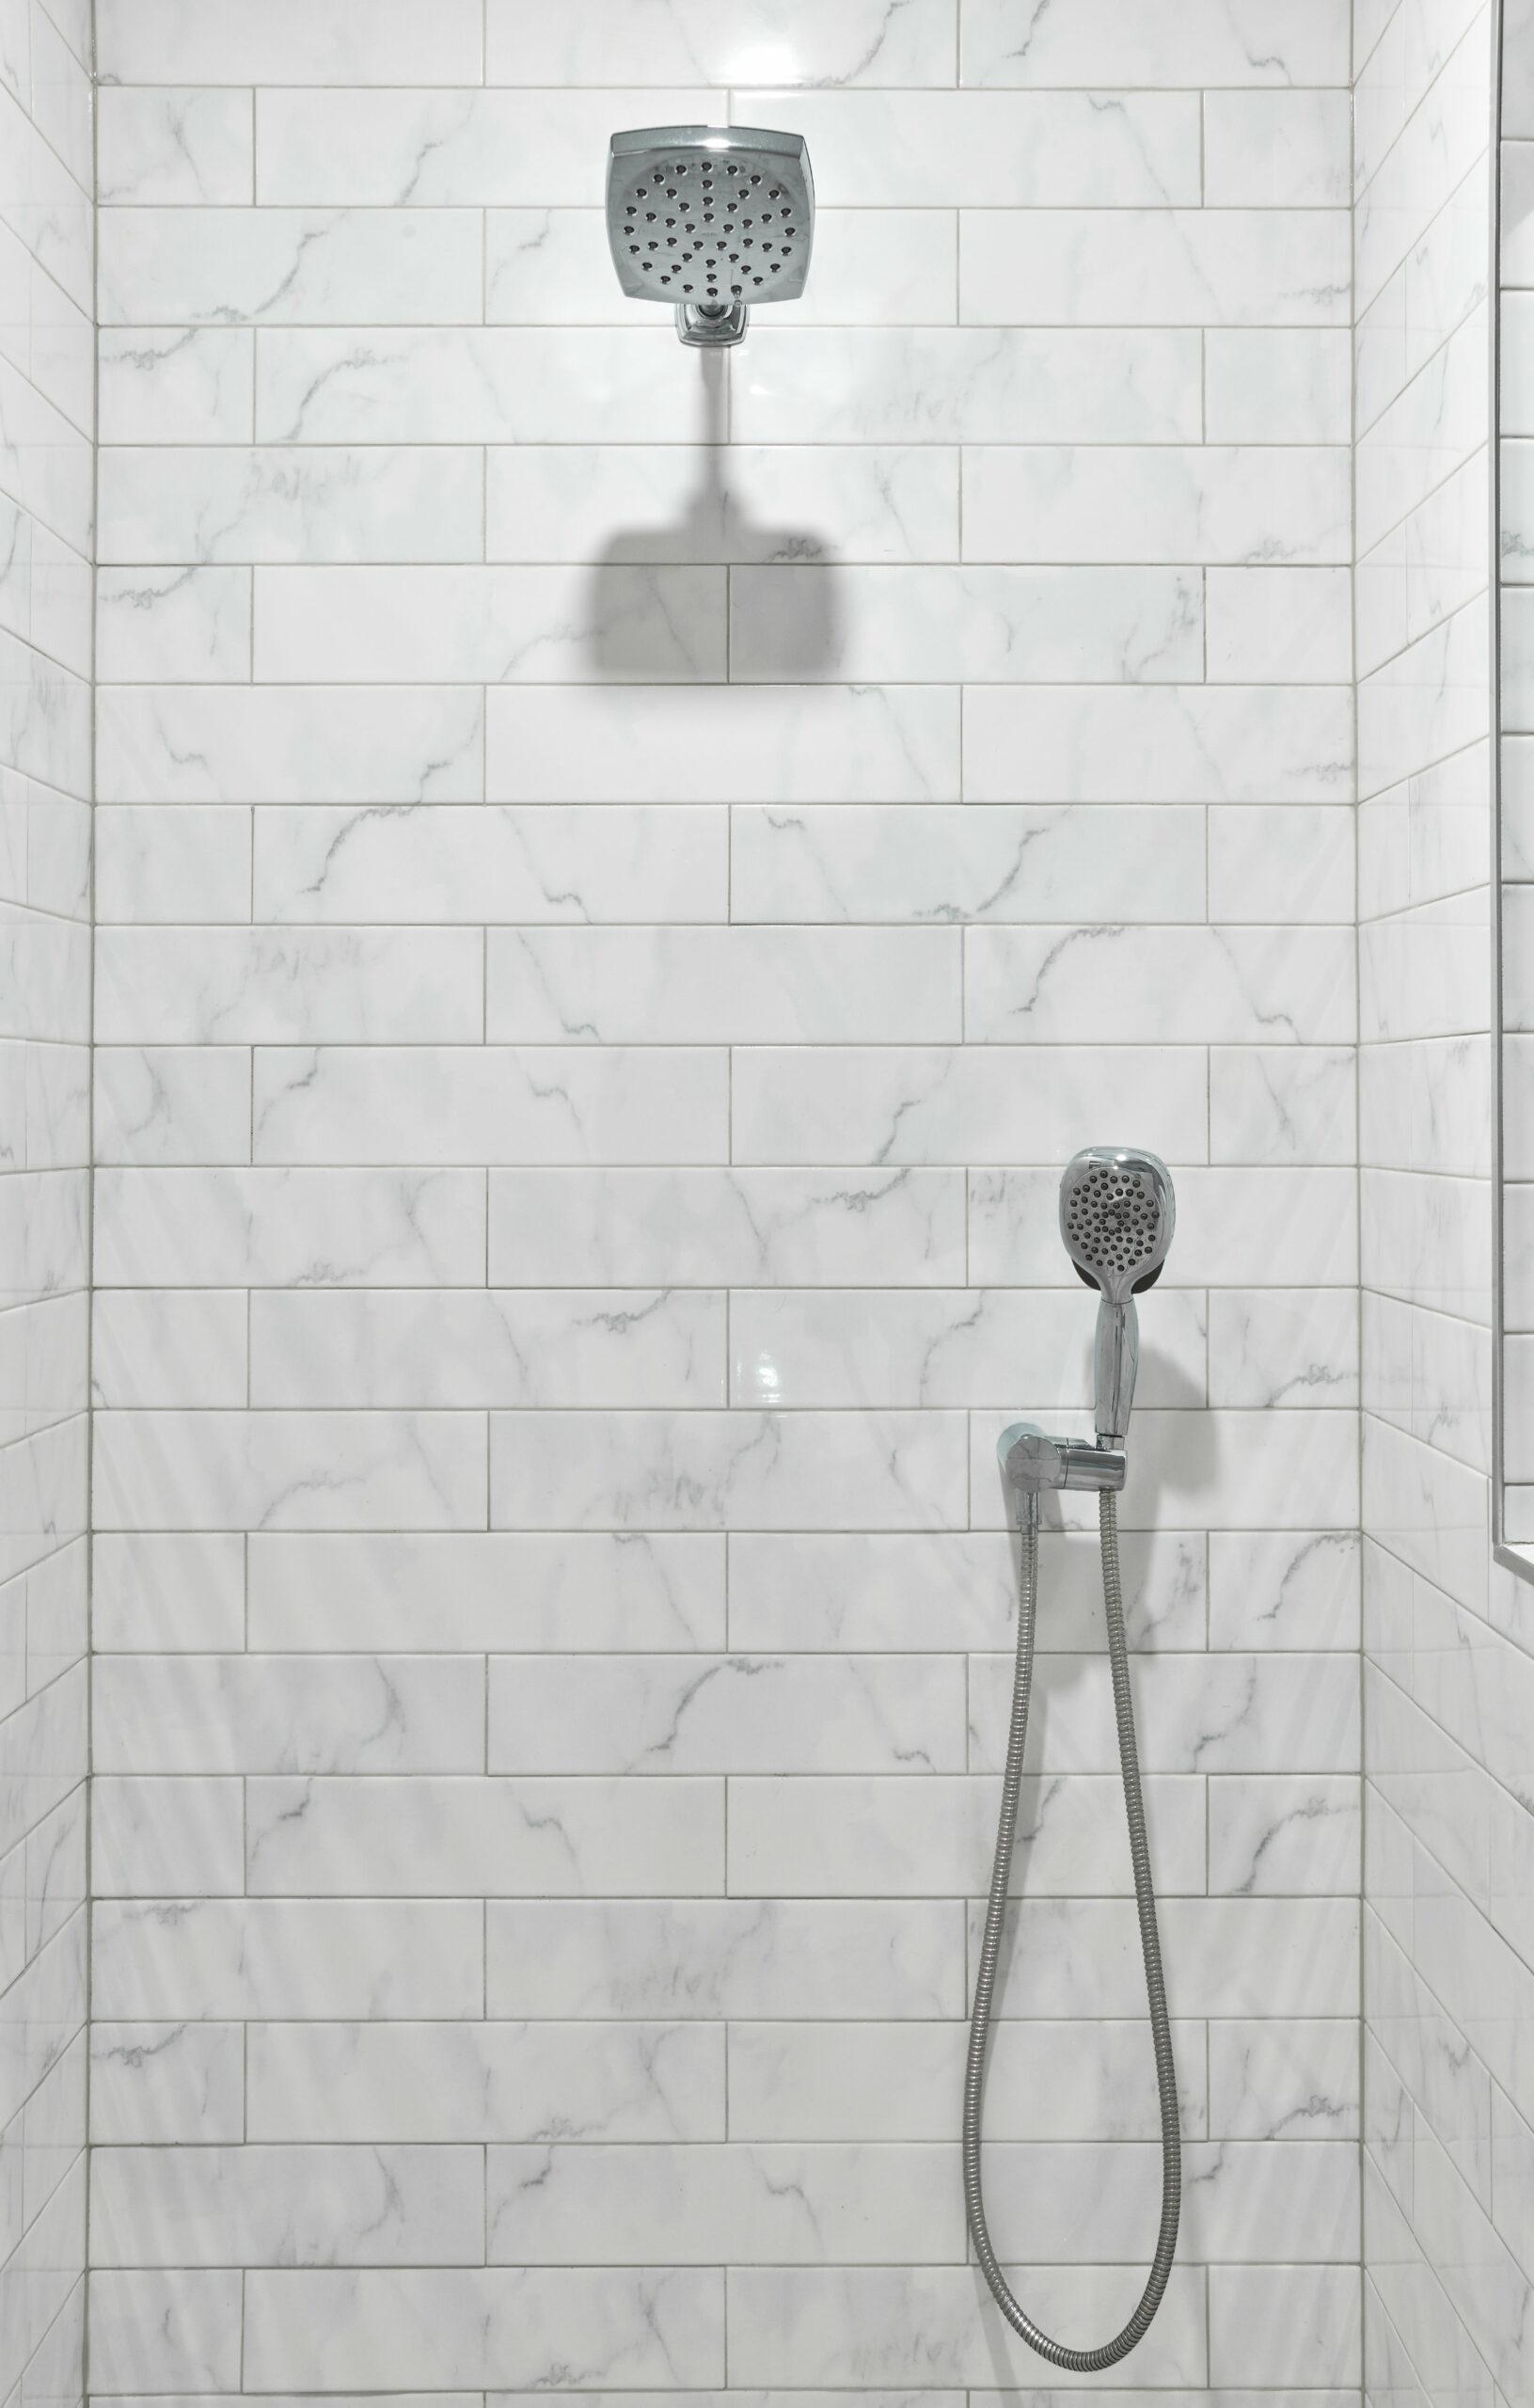 Lincoln Park Bathroom Remodel Walk-in Shower